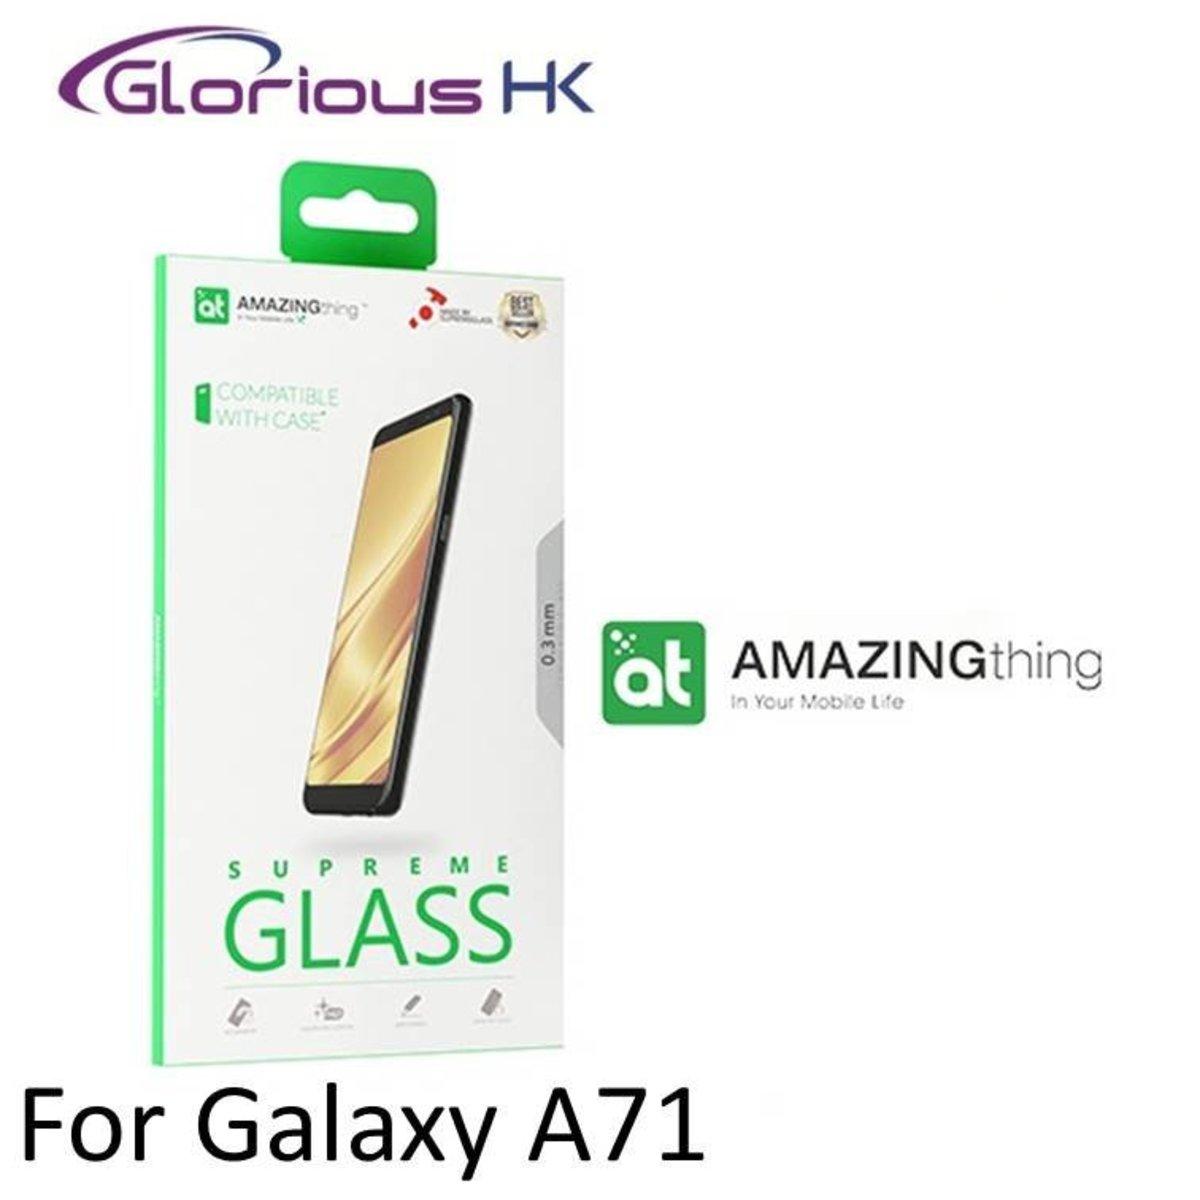 Galaxy A71 SupremeGlass 全覆蓋玻璃保護貼